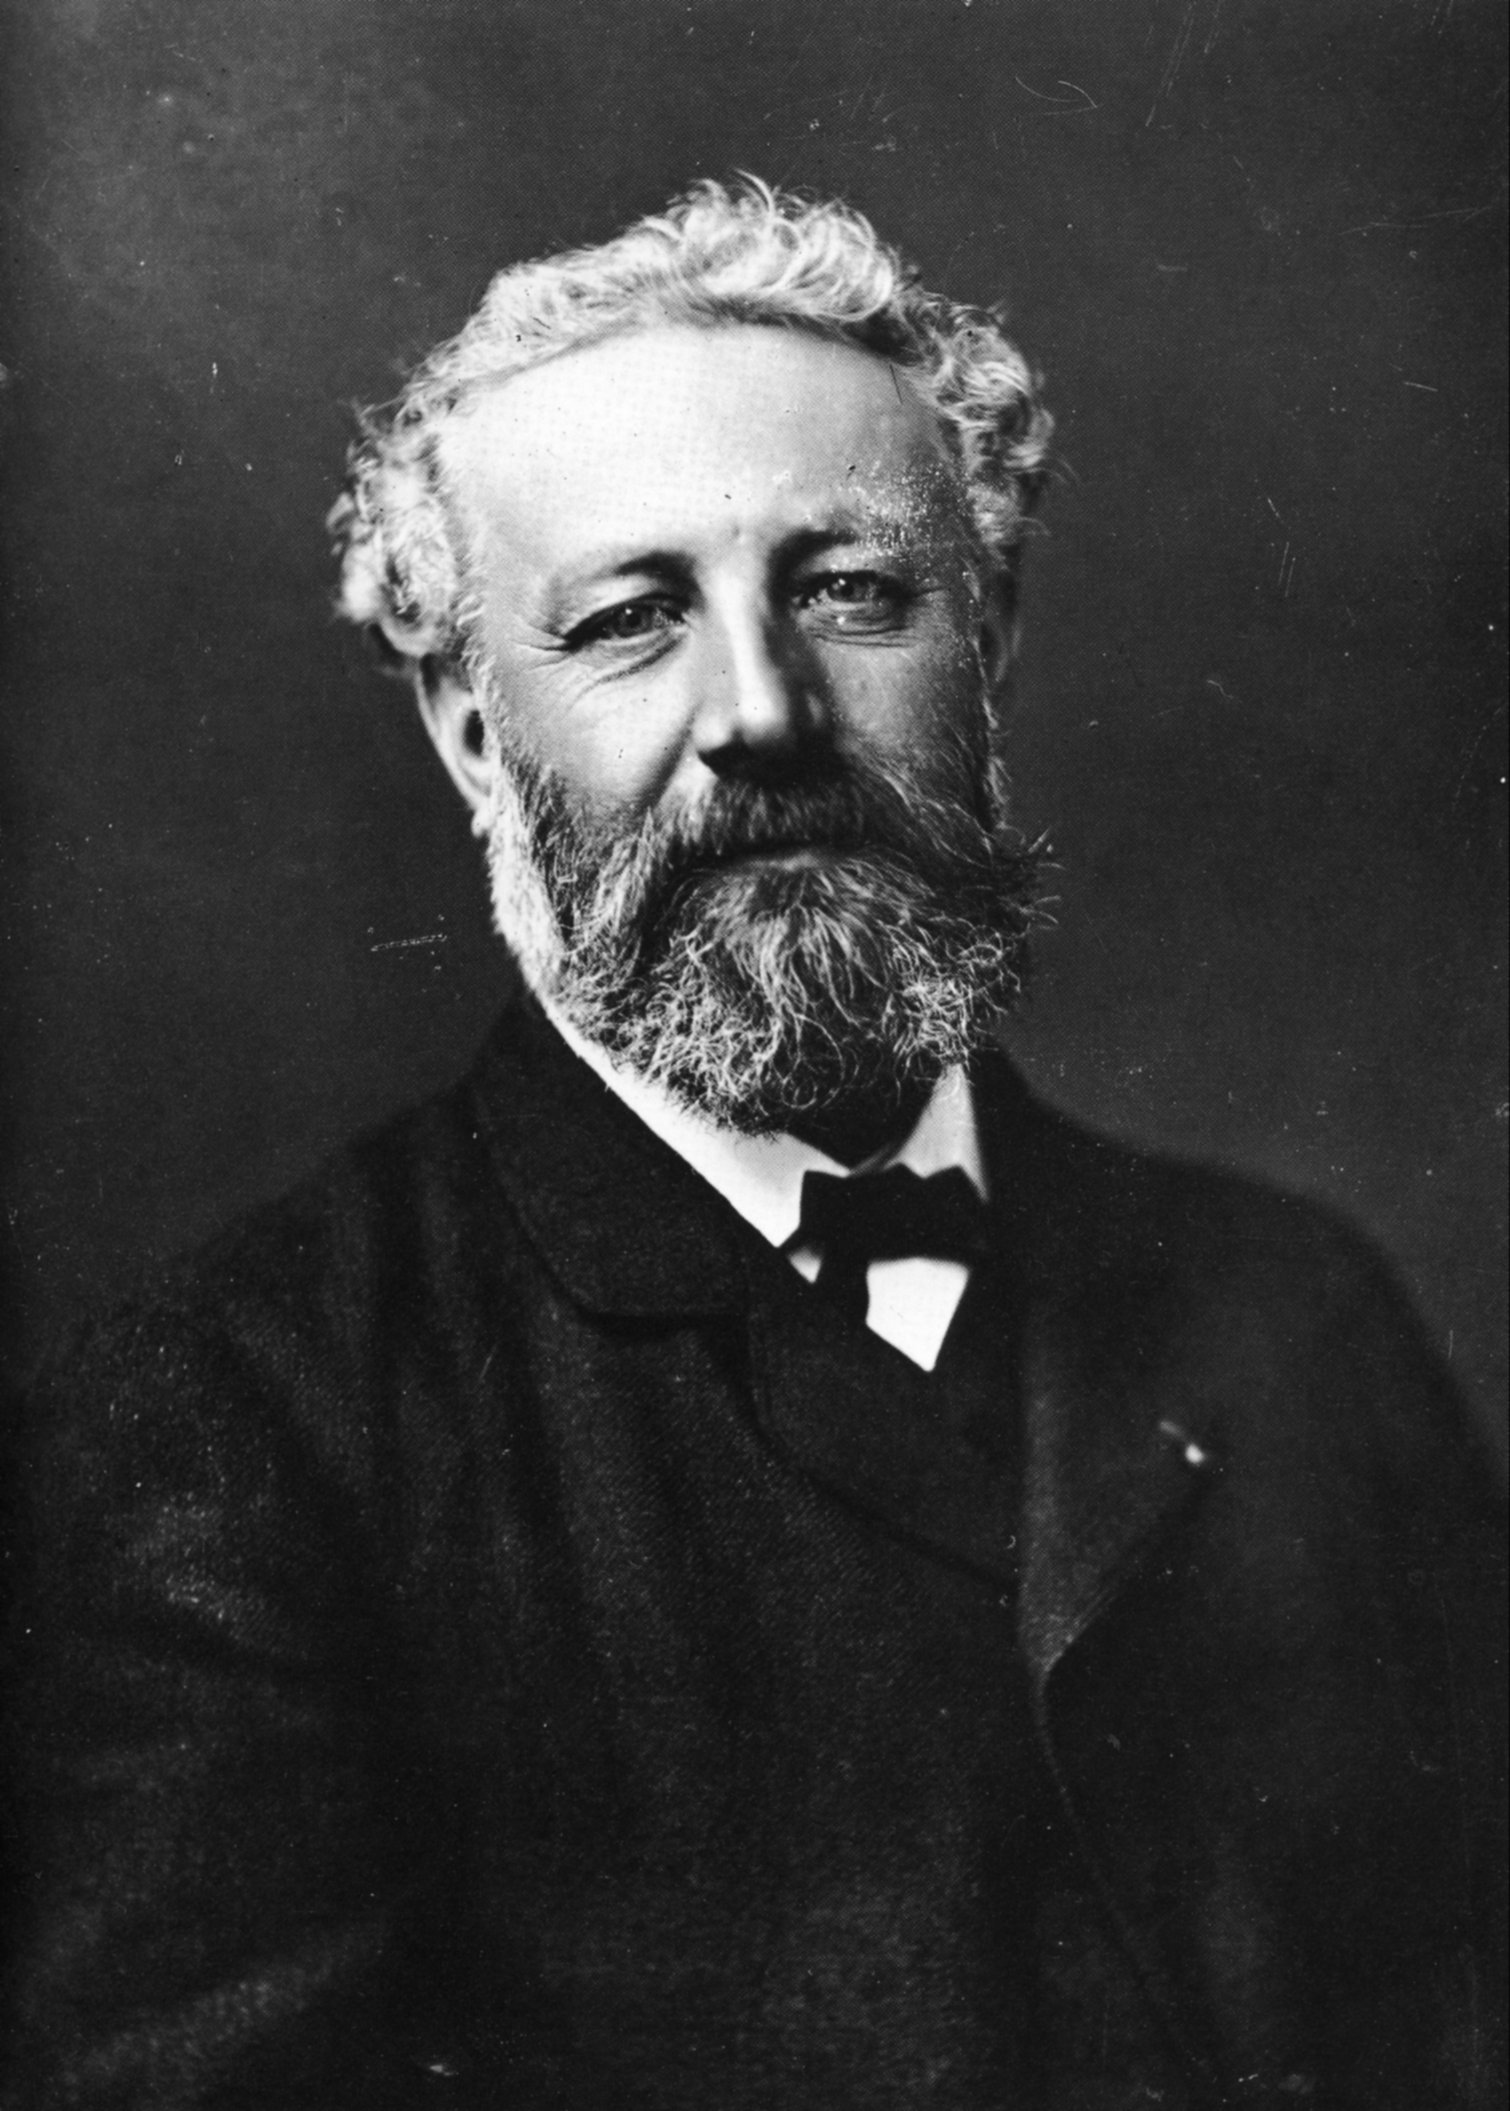 Félix_Nadar_1820-1910_portraits_Jules_Verne.jpg